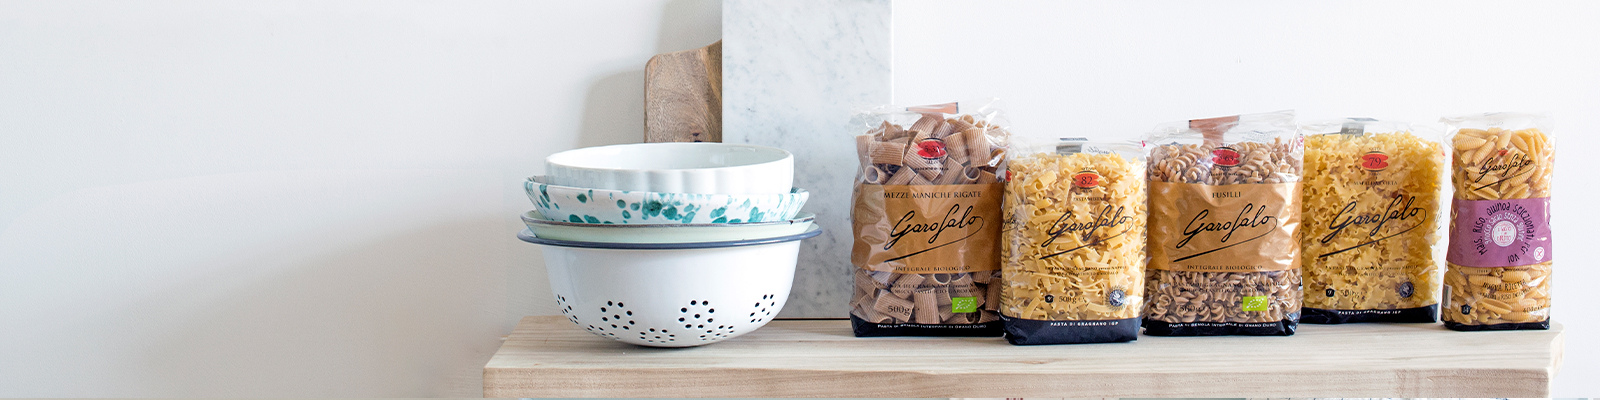 Pasta Garofalo - Produits